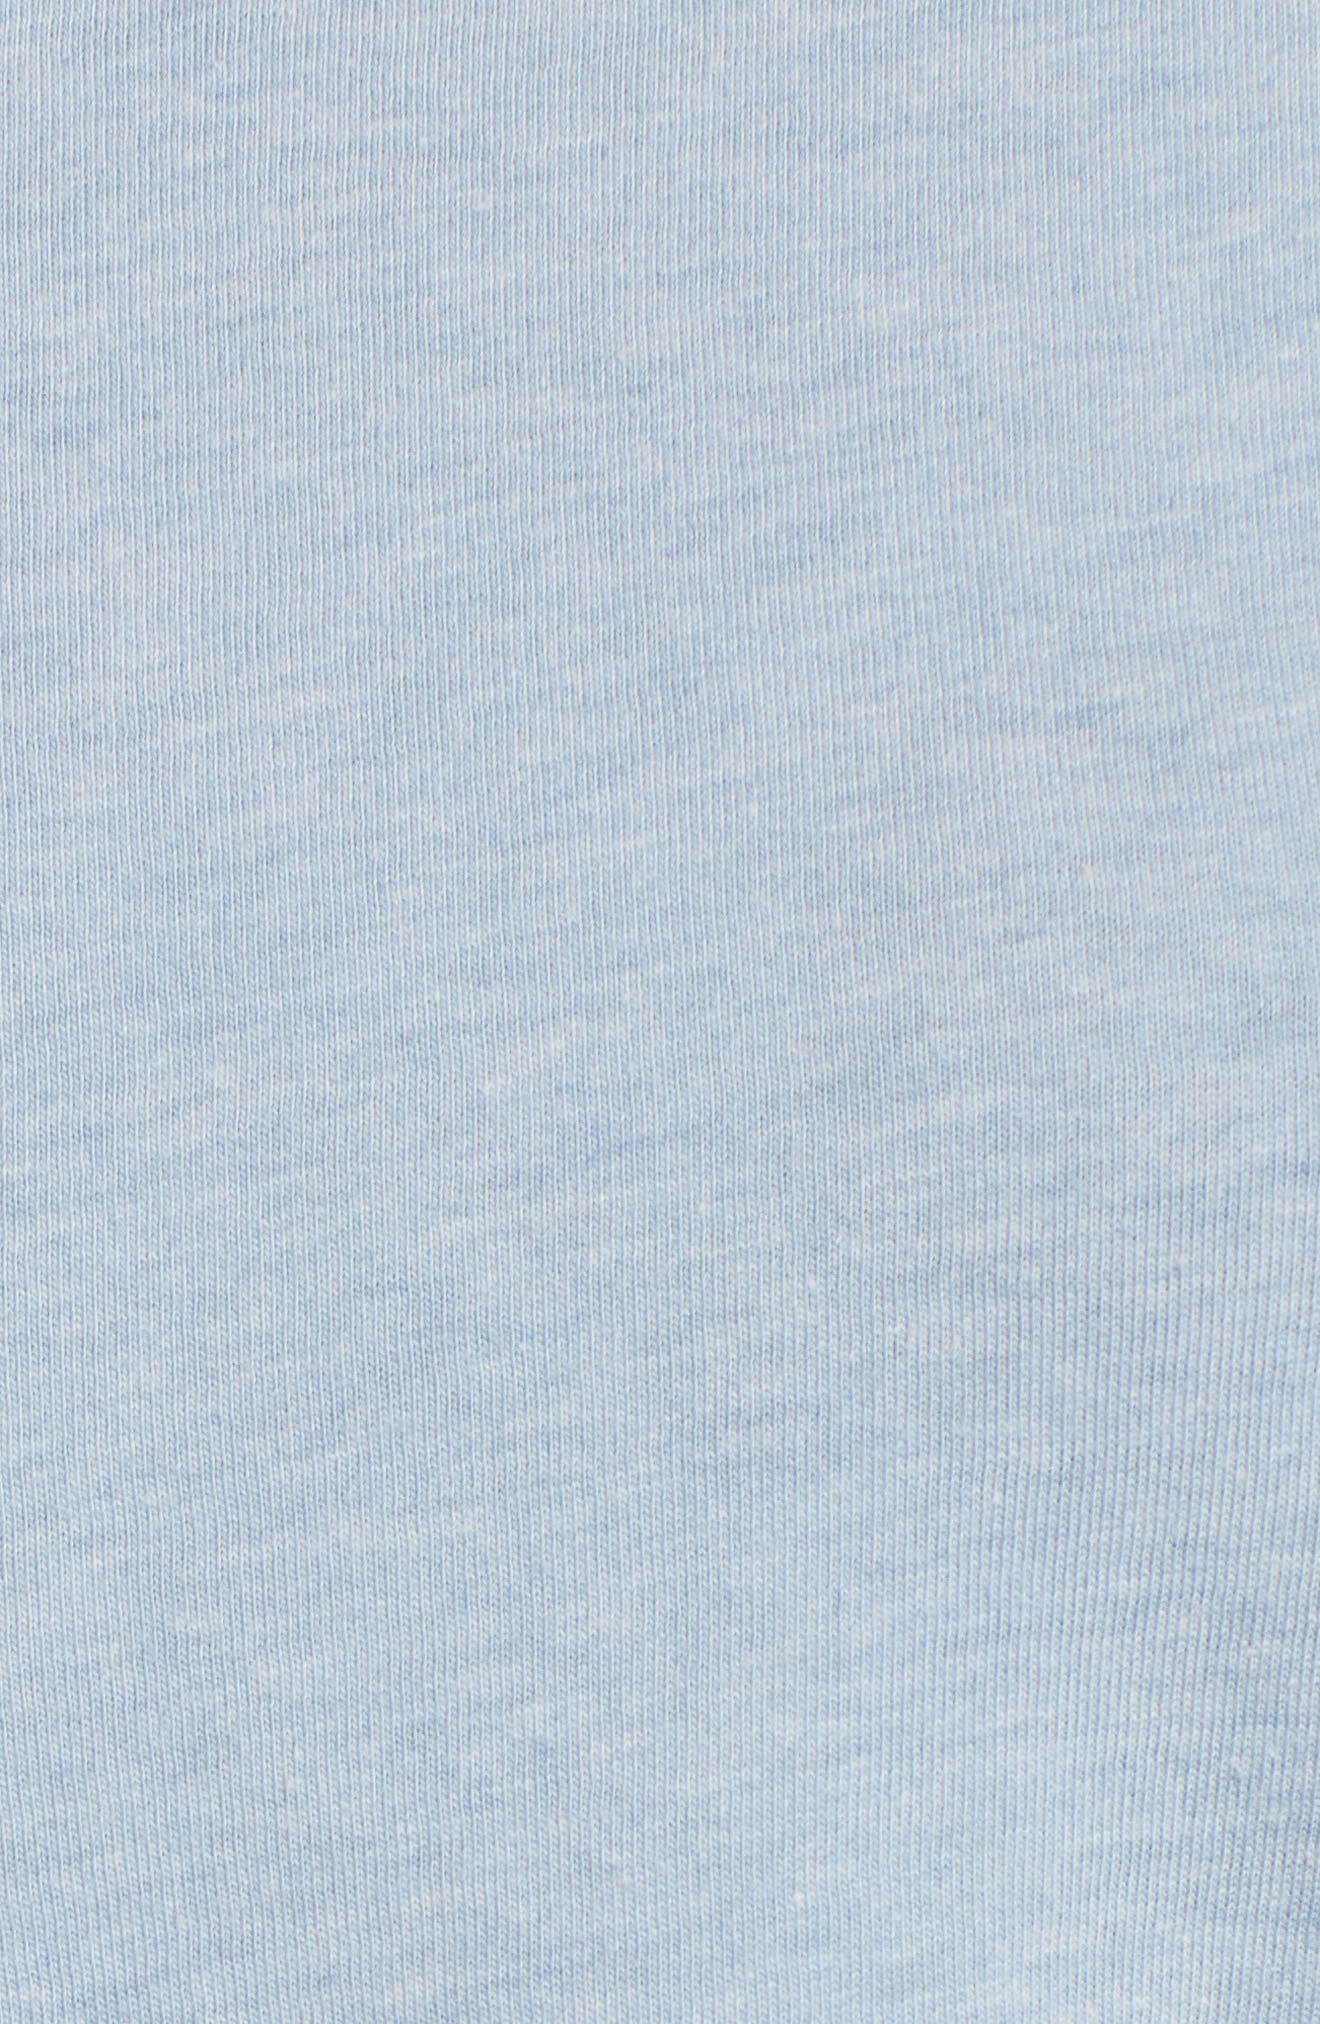 Cutout Neck Front Tie Tee,                             Alternate thumbnail 6, color,                             460